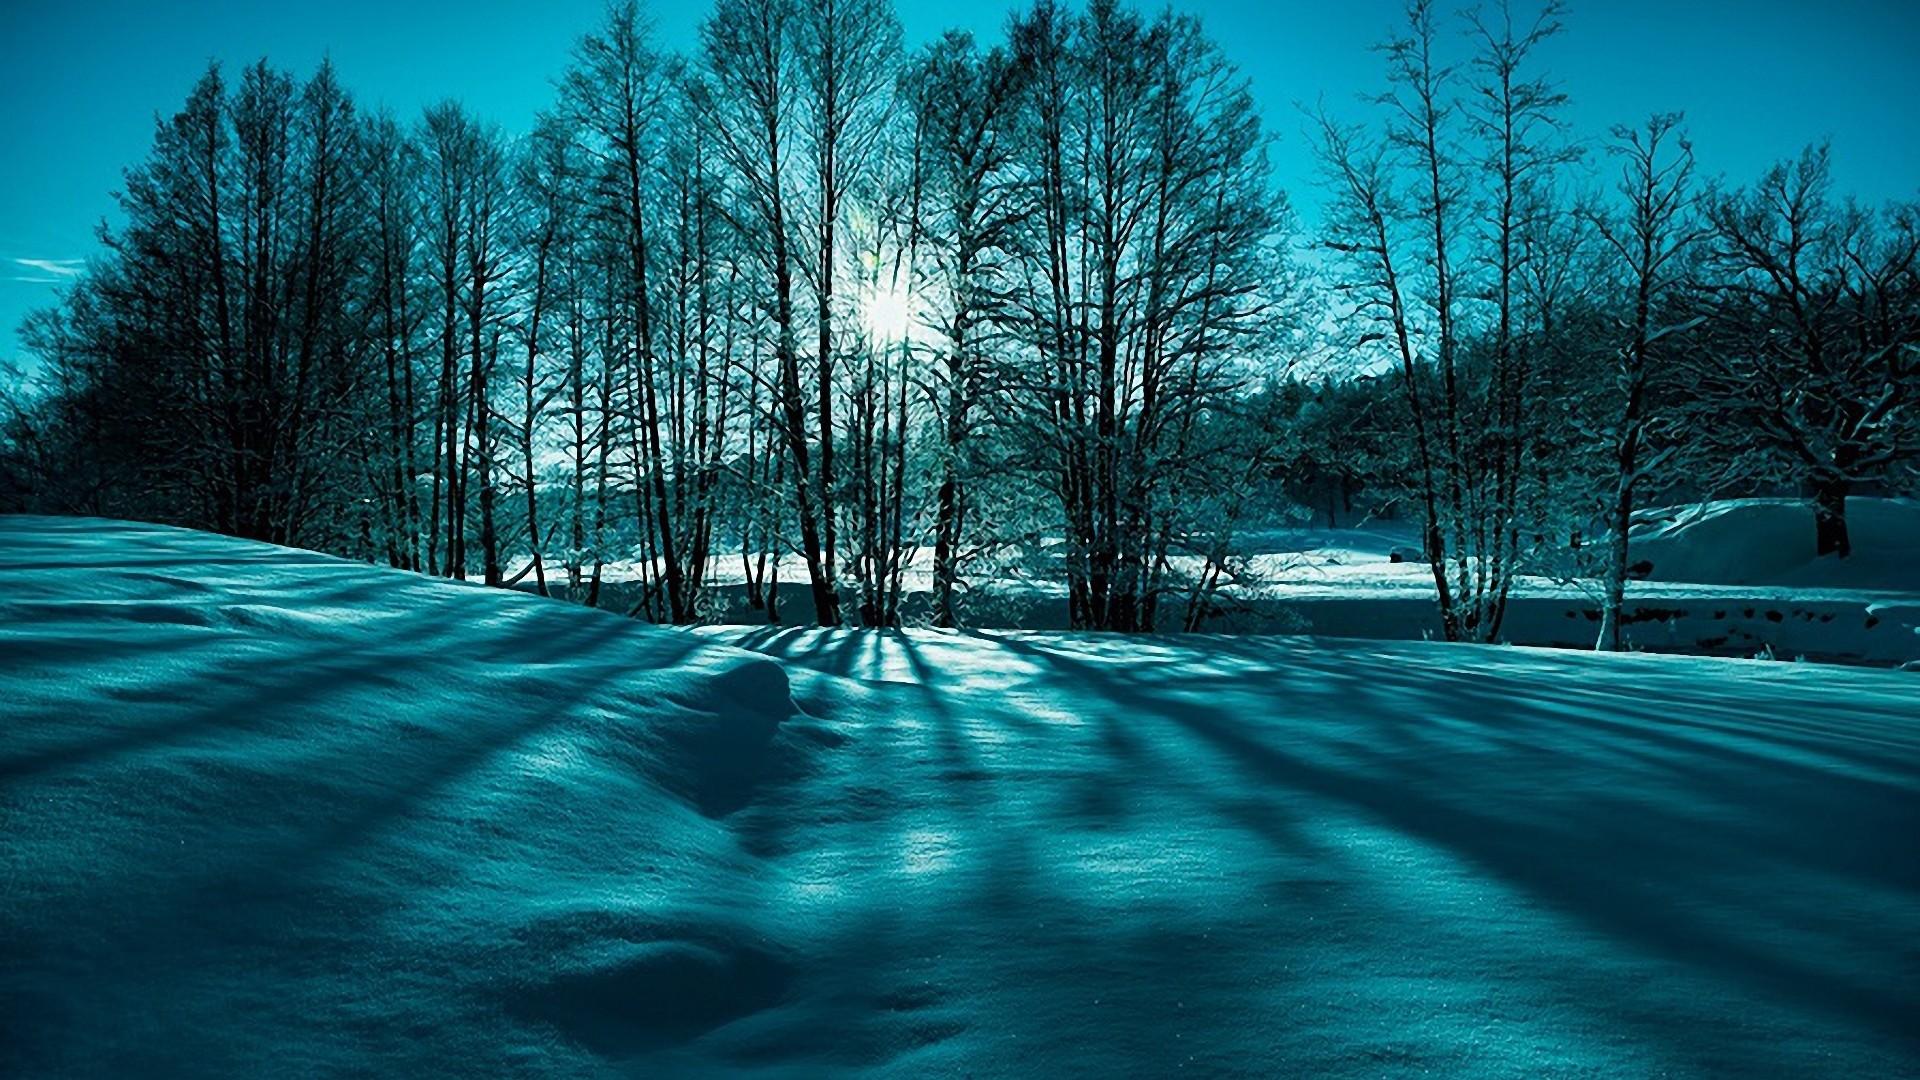 Fantastic Winter Scenery